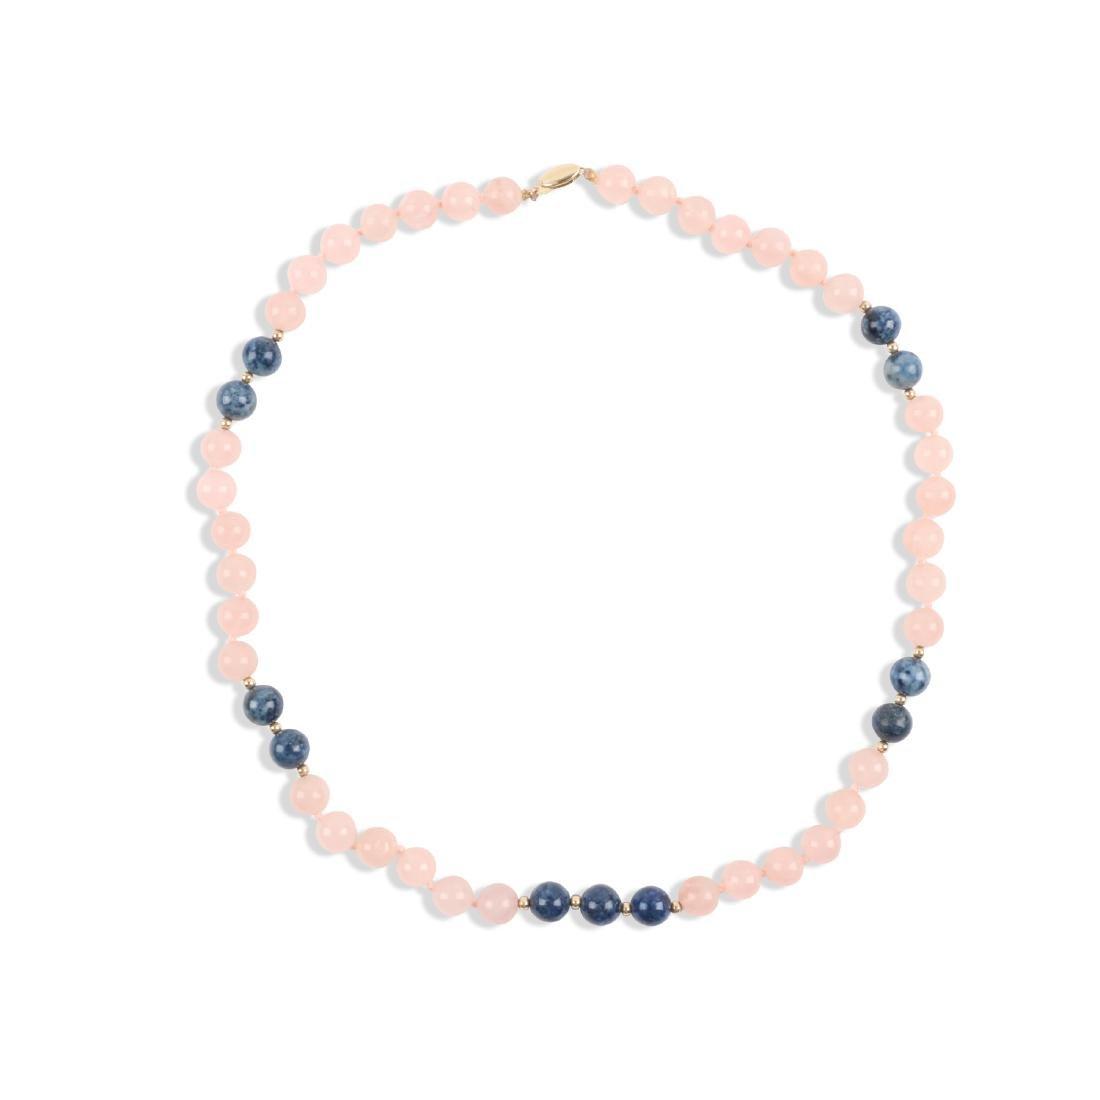 A Rose Quartz & Lapis Lazuli Beaded Necklace